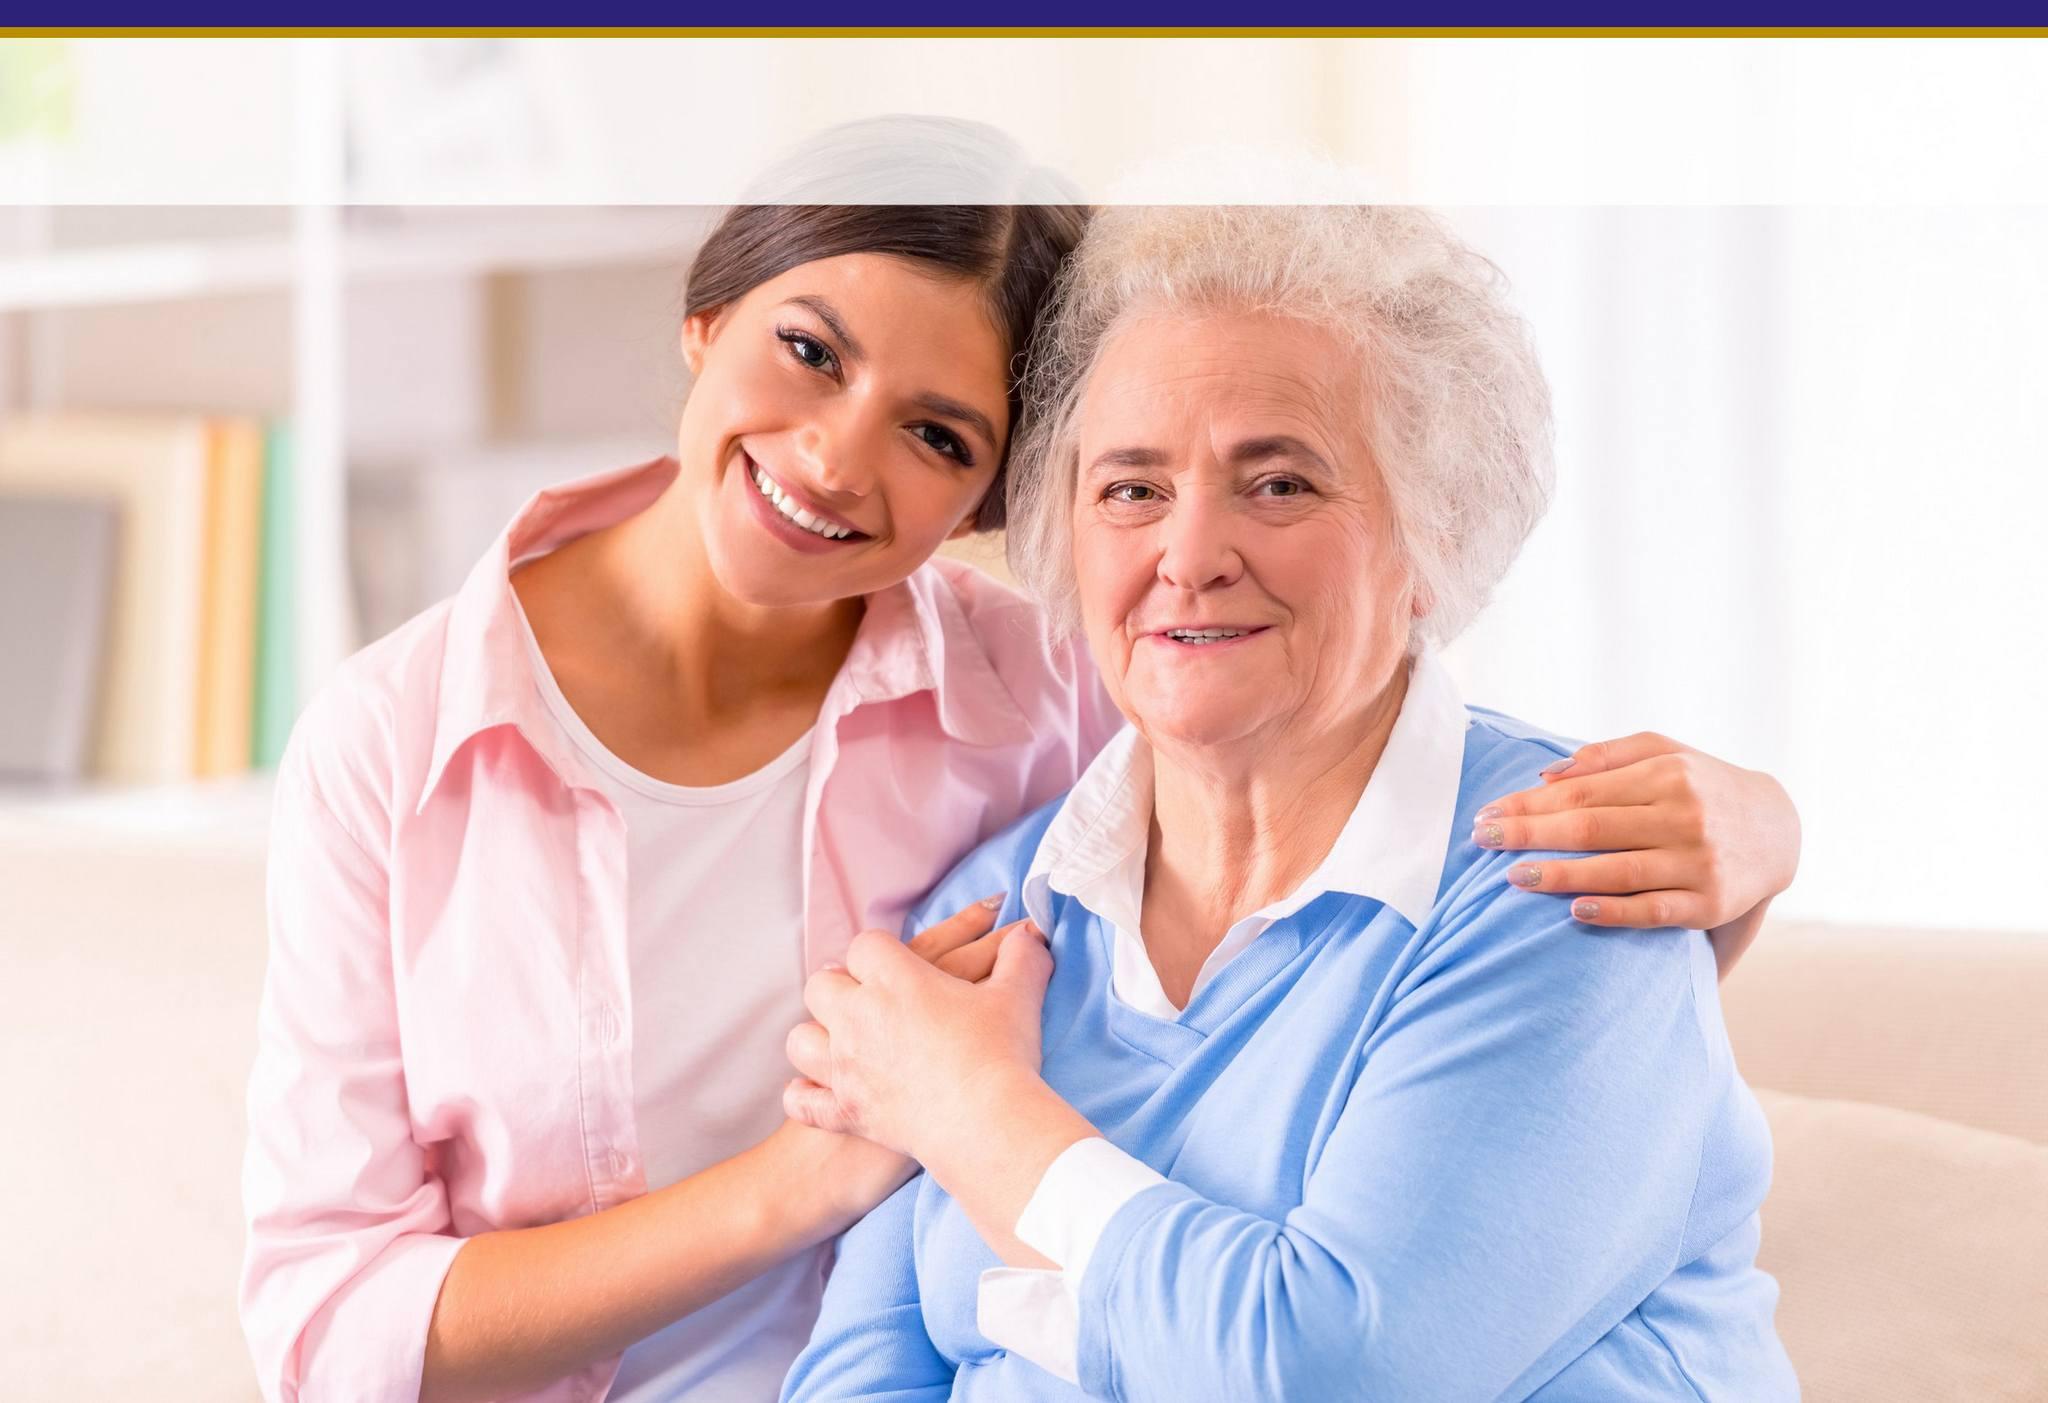 pflegekraft und seniorin